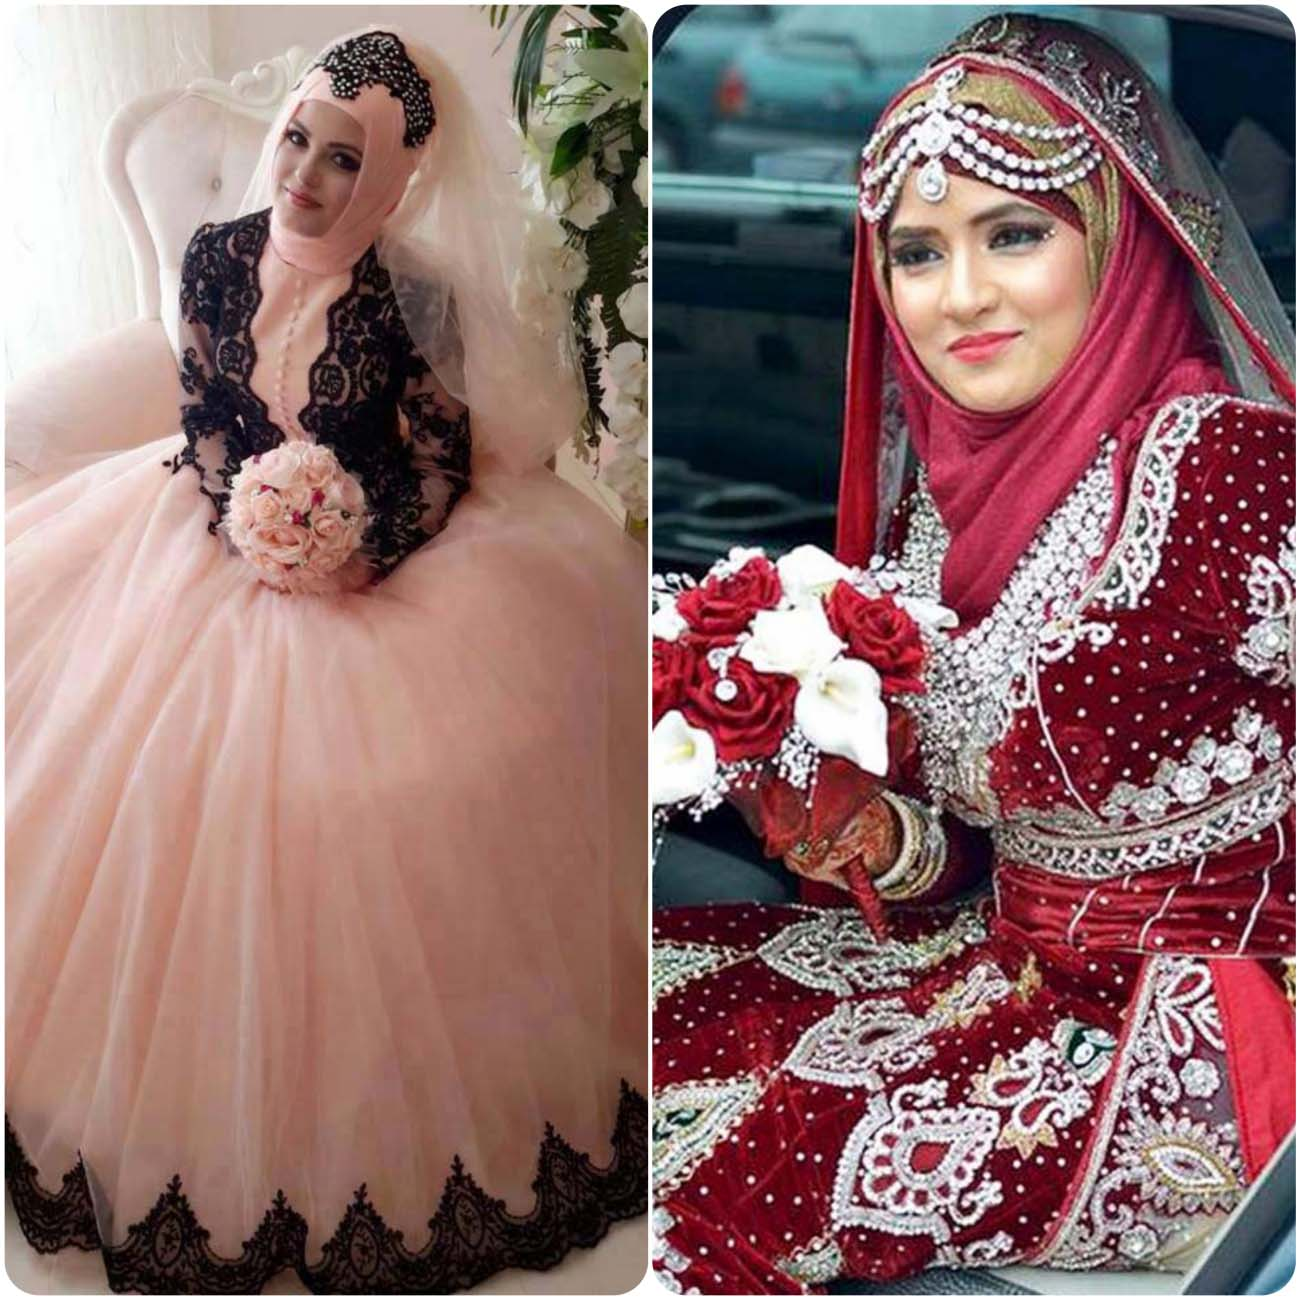 Designers Abaya Dresses Designs For Wedding Bridals 2016-2017...styloplanet (23)